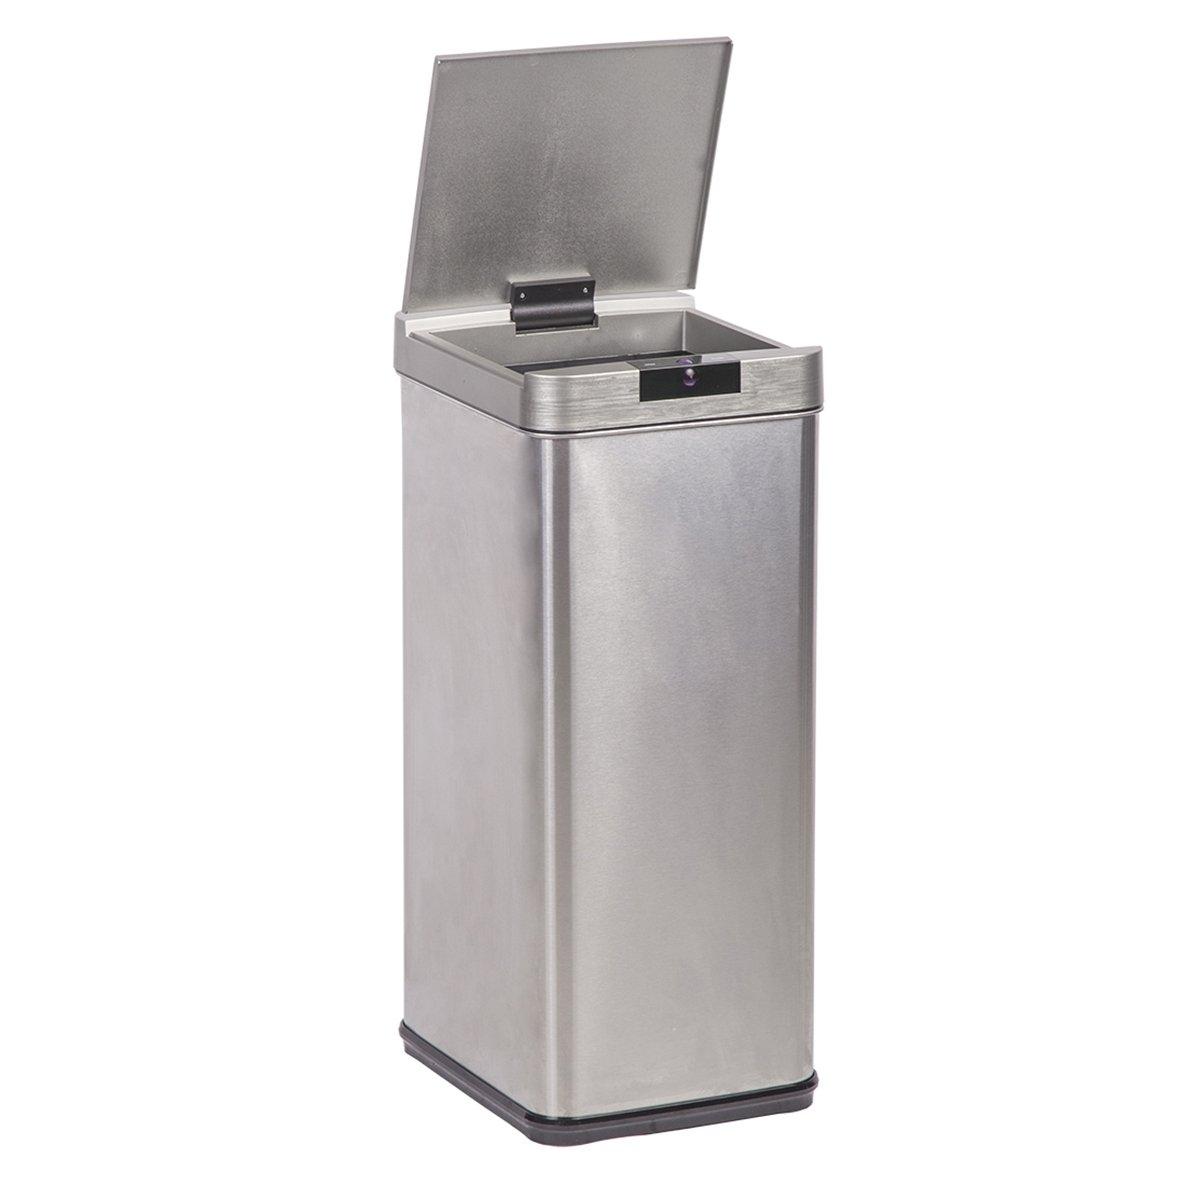 Amazon.com: 13-Gallon Trash Can, Sensor Stainless Steel Trash Bin ...